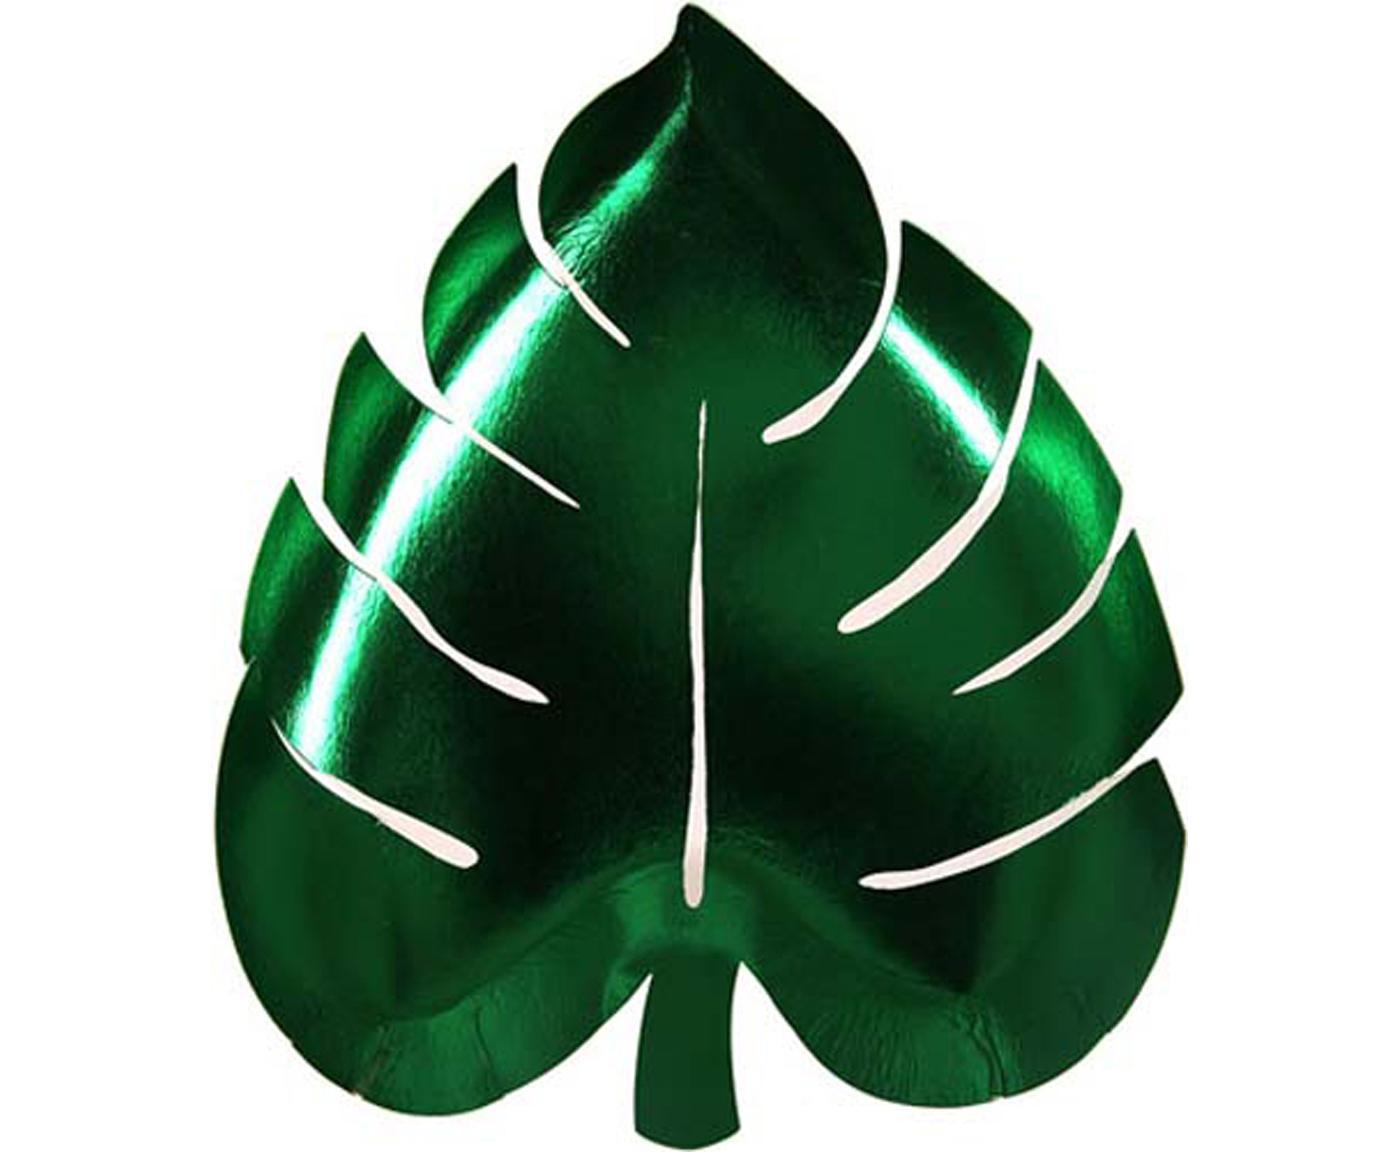 Papieren borden Palm Leaf, 8 stuks, Gecoat papier, Groen, B 23 x D 19 cm